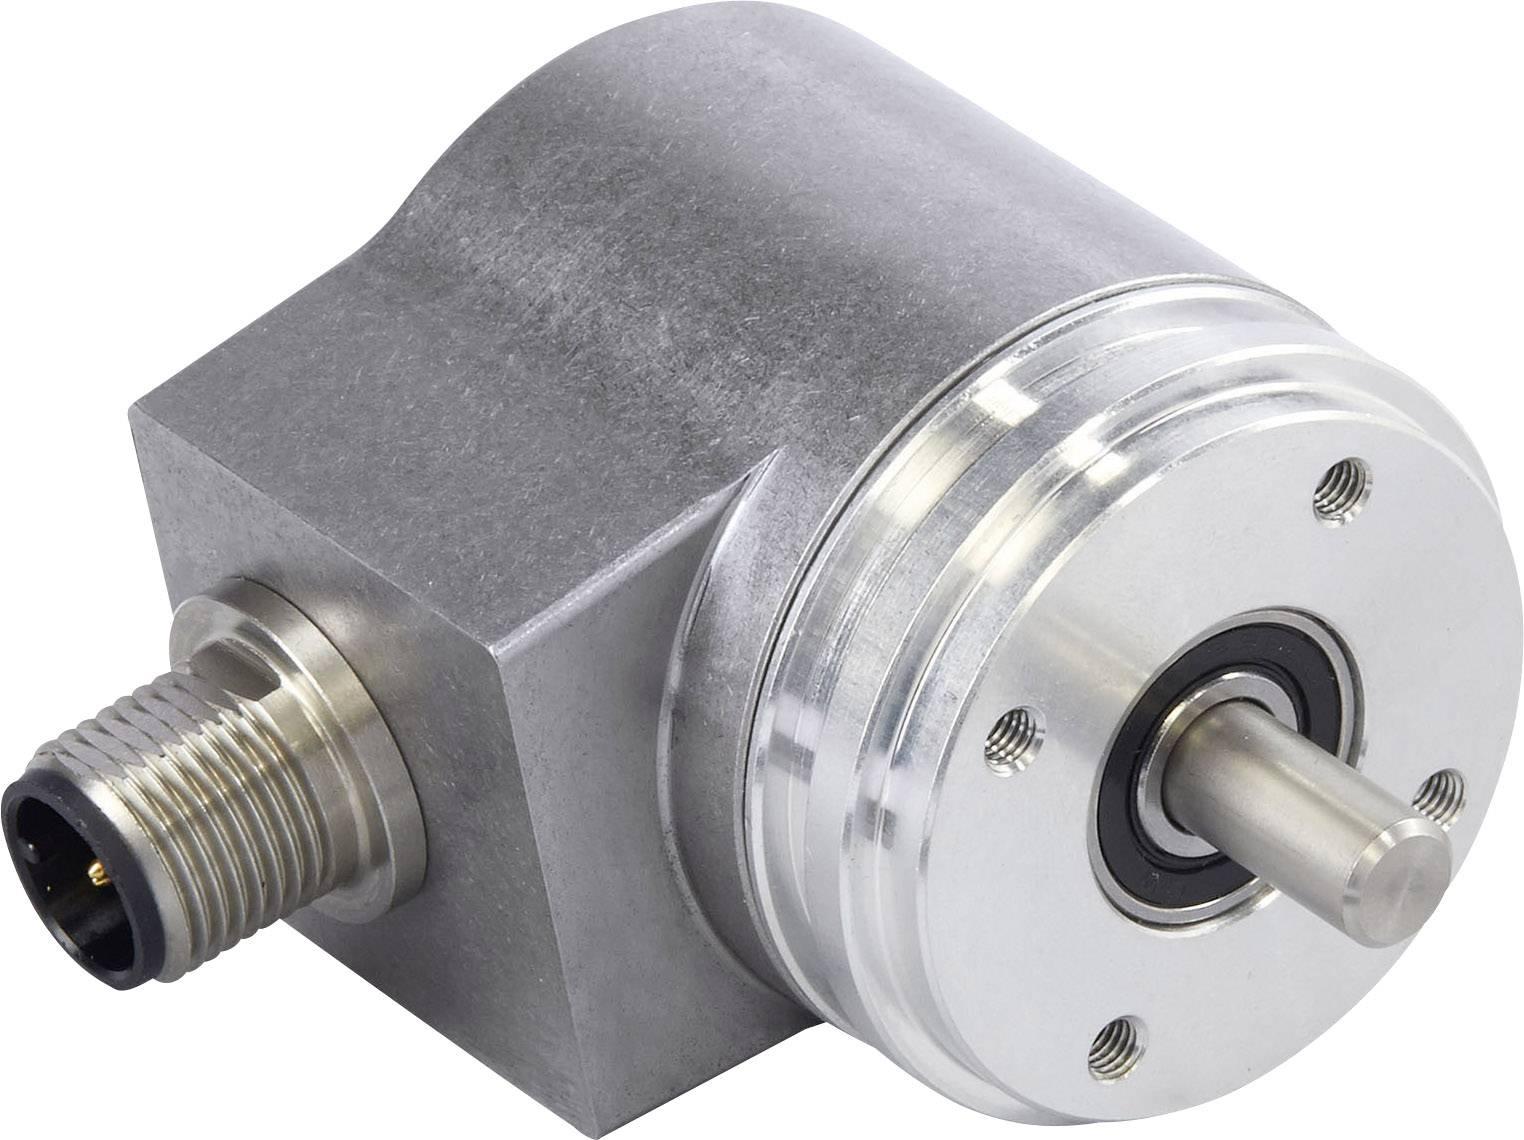 POSITAL IXARC MCD-AV003-0012-M100-CAW Analog Voltage Absolute Rotary Encoder